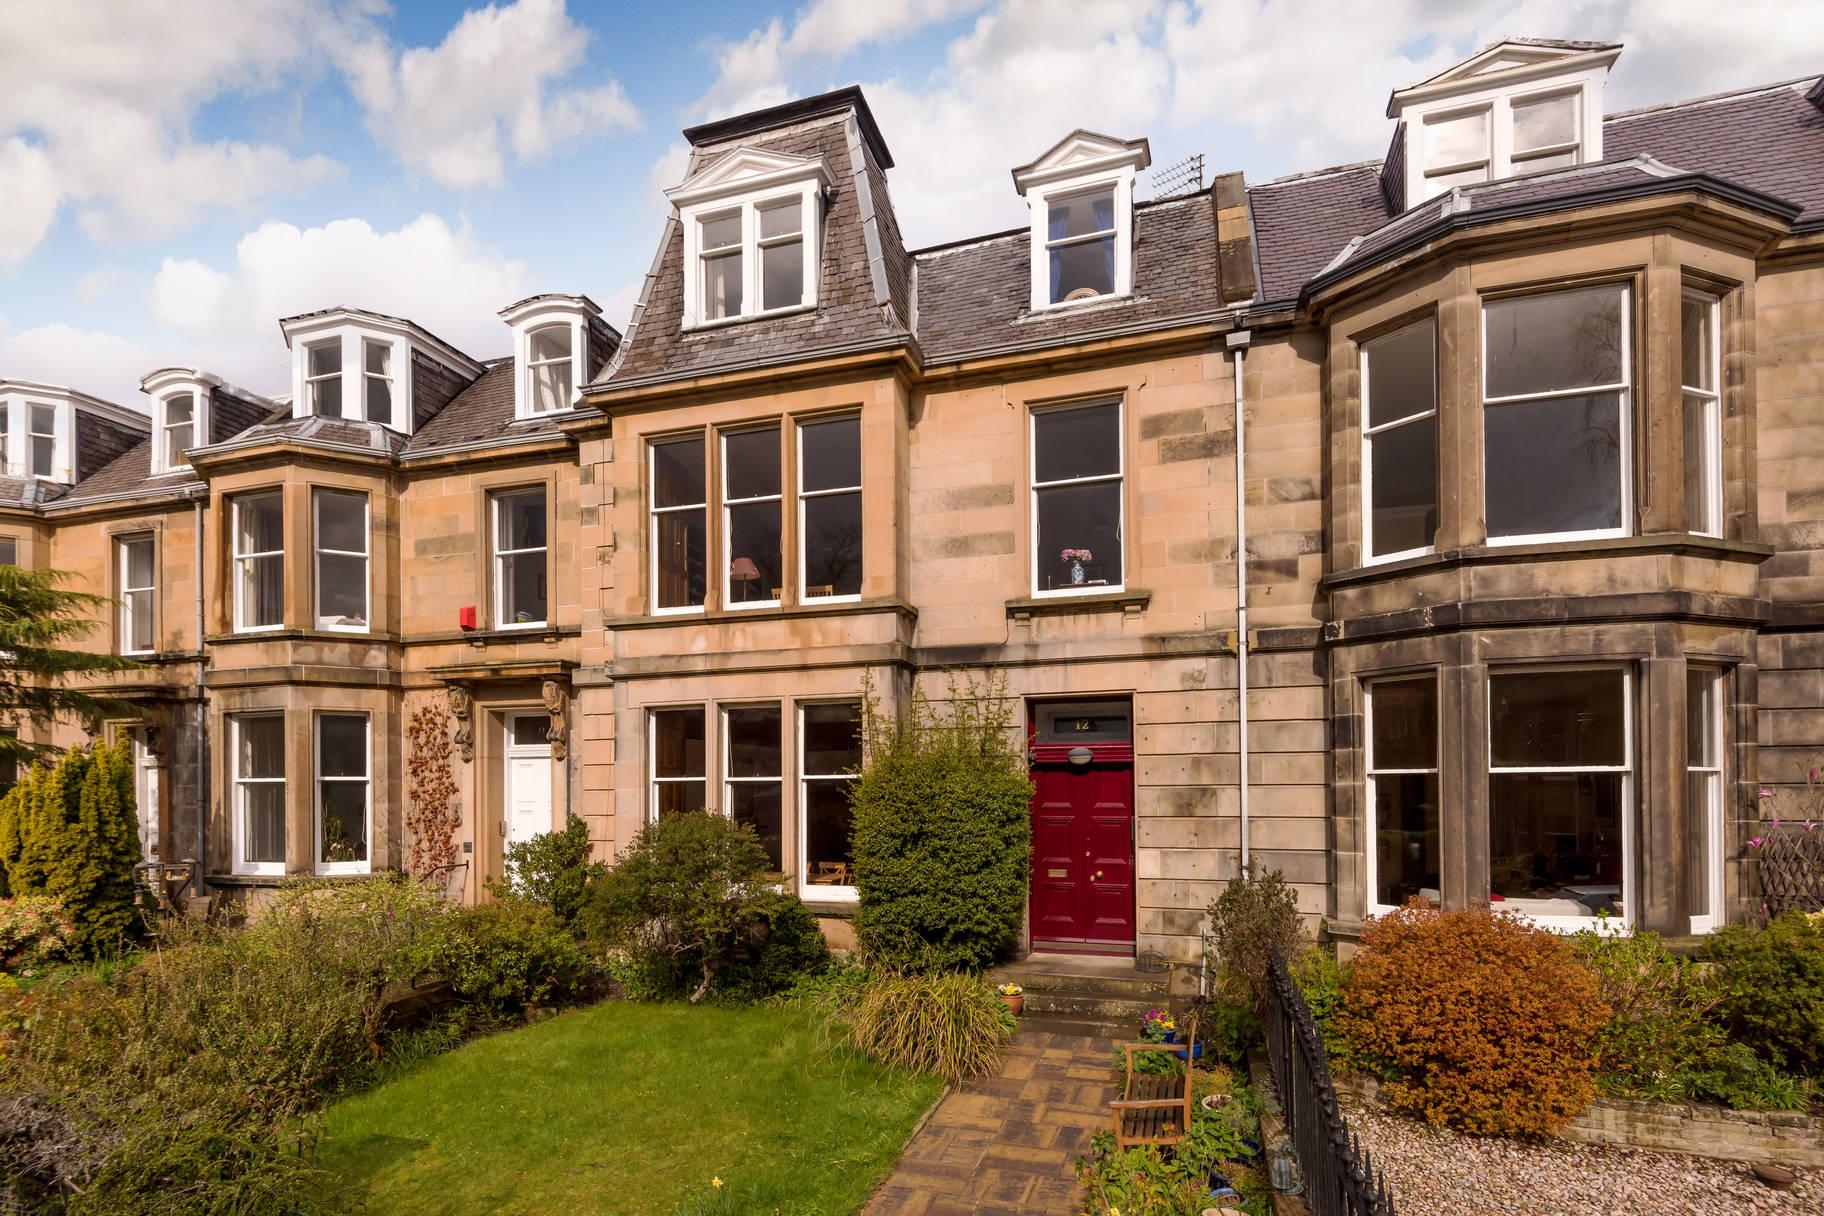 12/1 Grange Terrace, Edinburgh, EH9 2LD